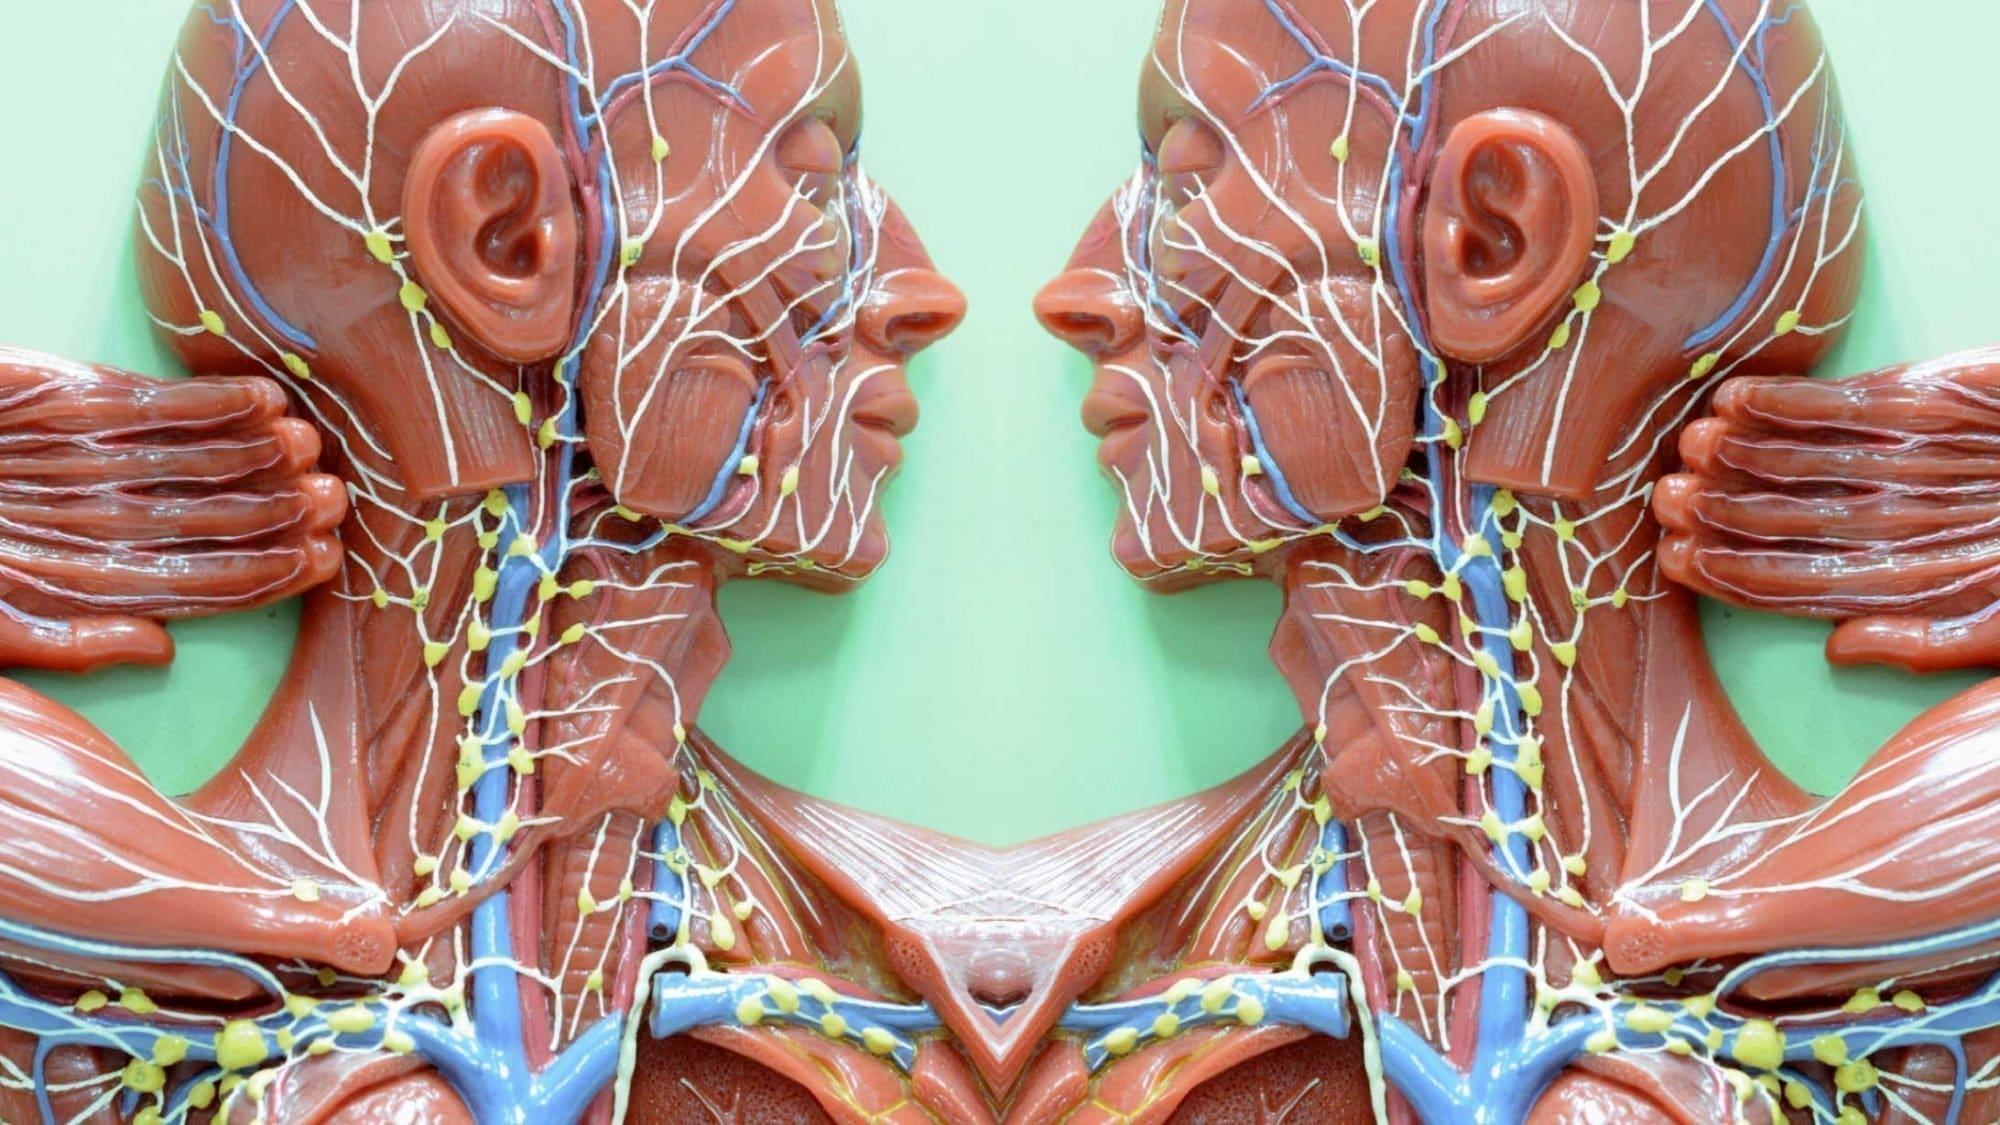 Illustration des Lymphsystems